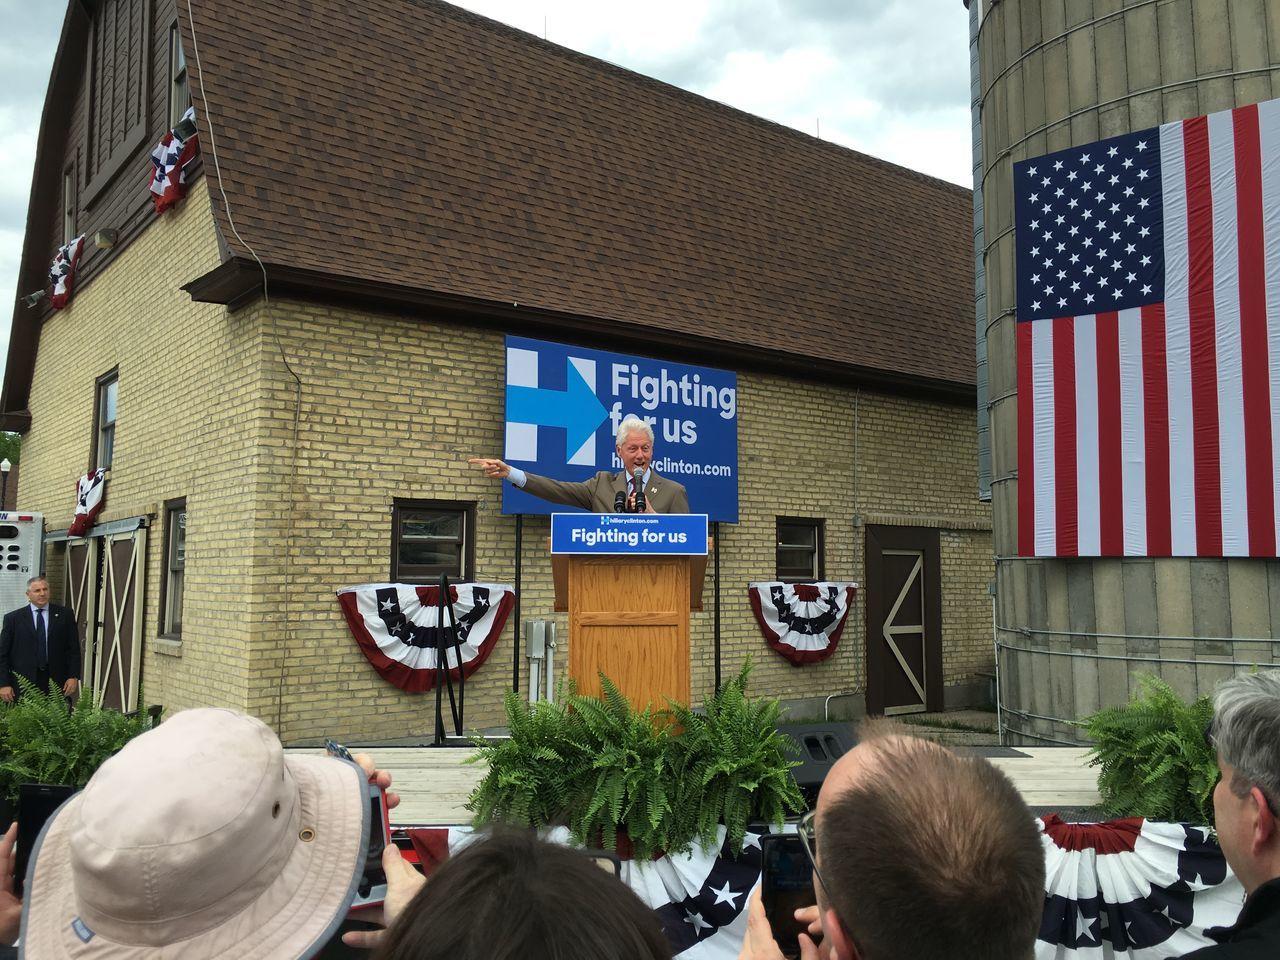 May 20, 2016 / Rheault Farm Bill Clinton Day Election Fargo North Dakota Outdoors President Presidential Campaign 2016 Presidential Election 2016 Rheault Farm Sky United States